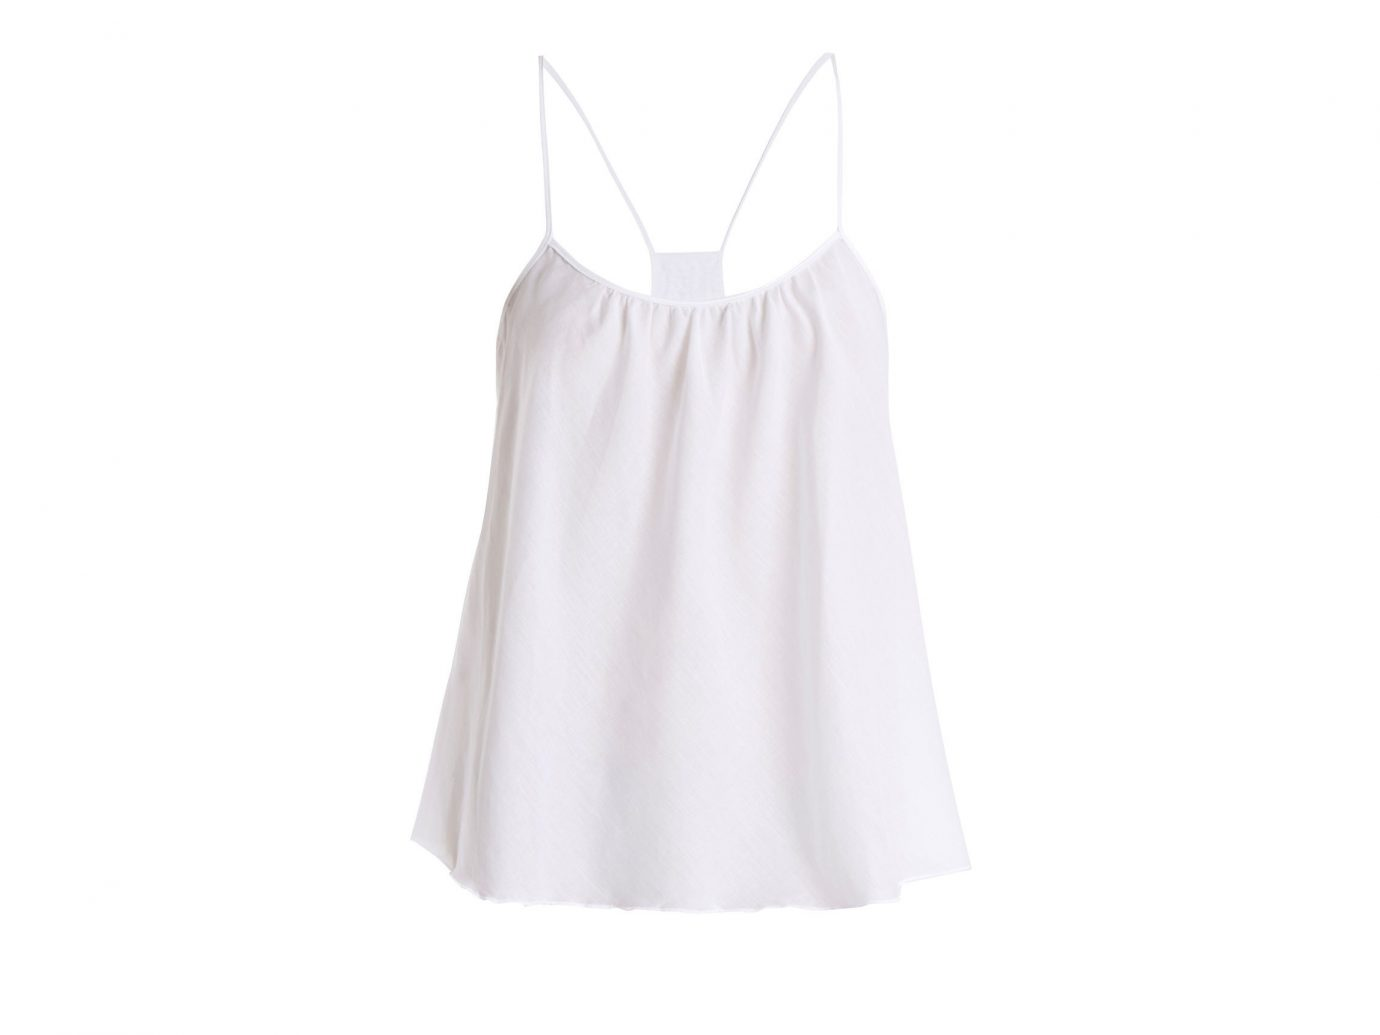 Style + Design Travel Shop white clothing day dress dress neck product sleeve nightwear